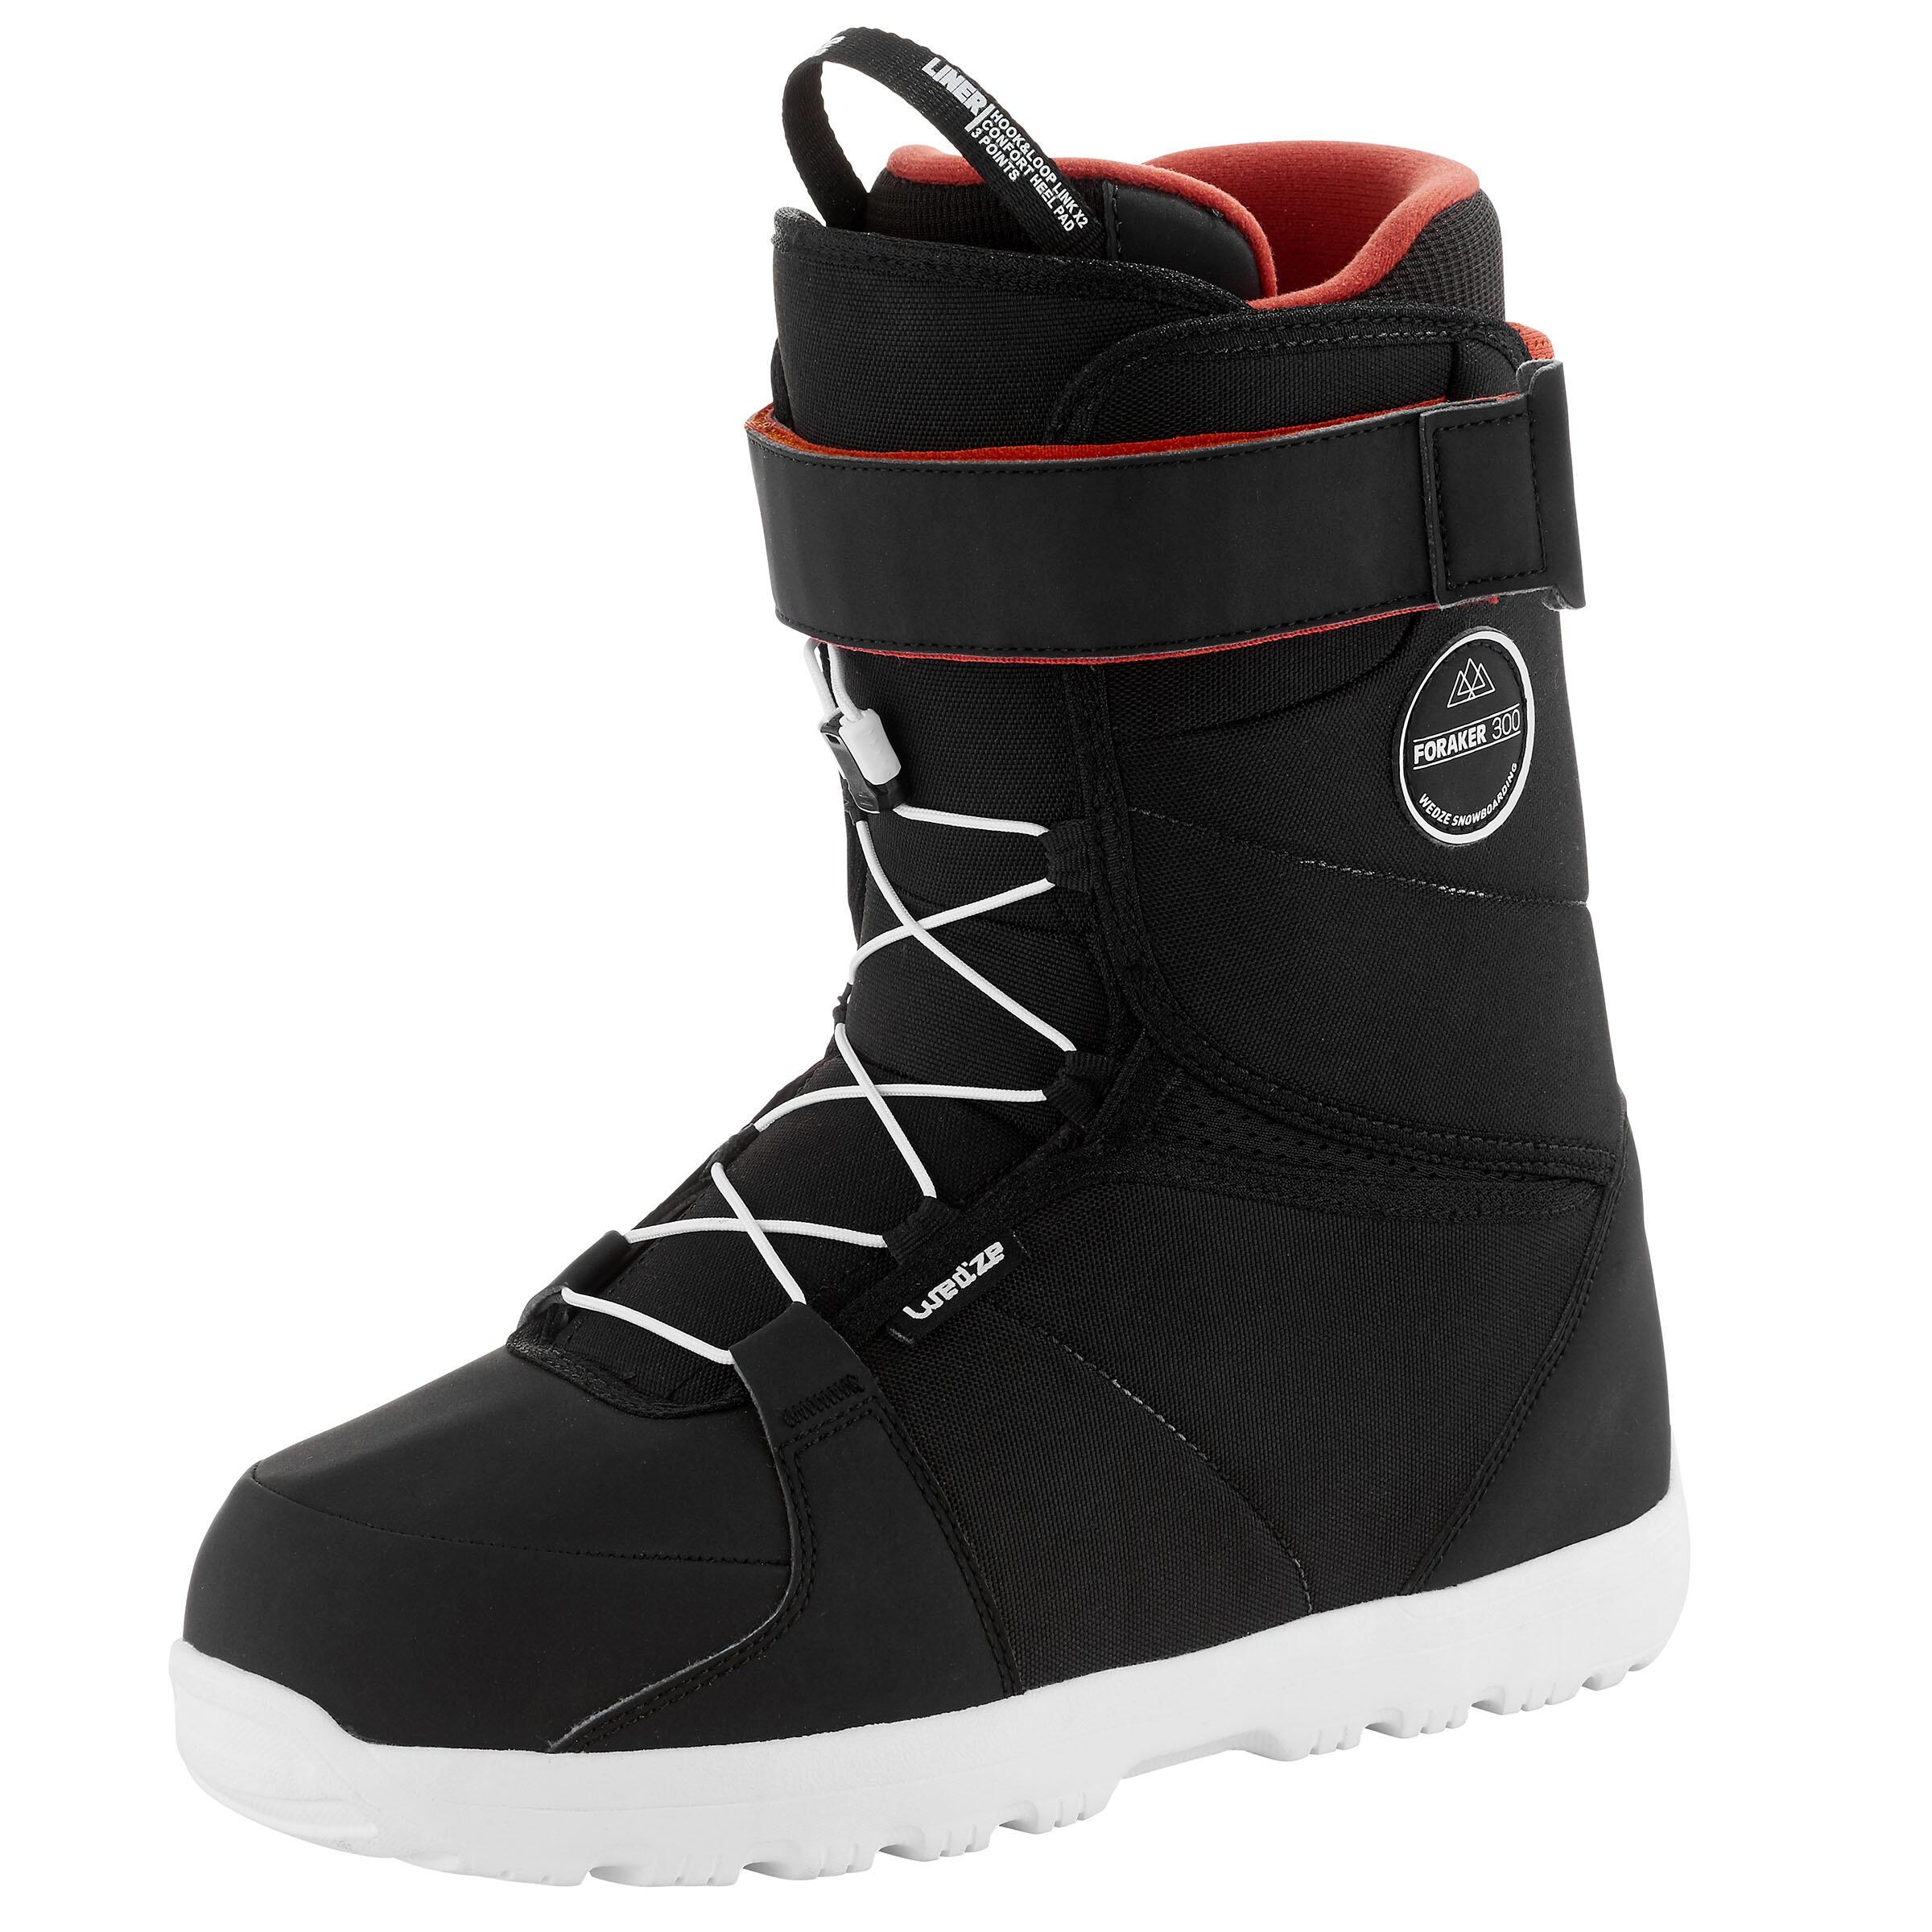 Wedze Chaussures de snowboard homme polyvalente FORAKER 300, Noir - Wedze